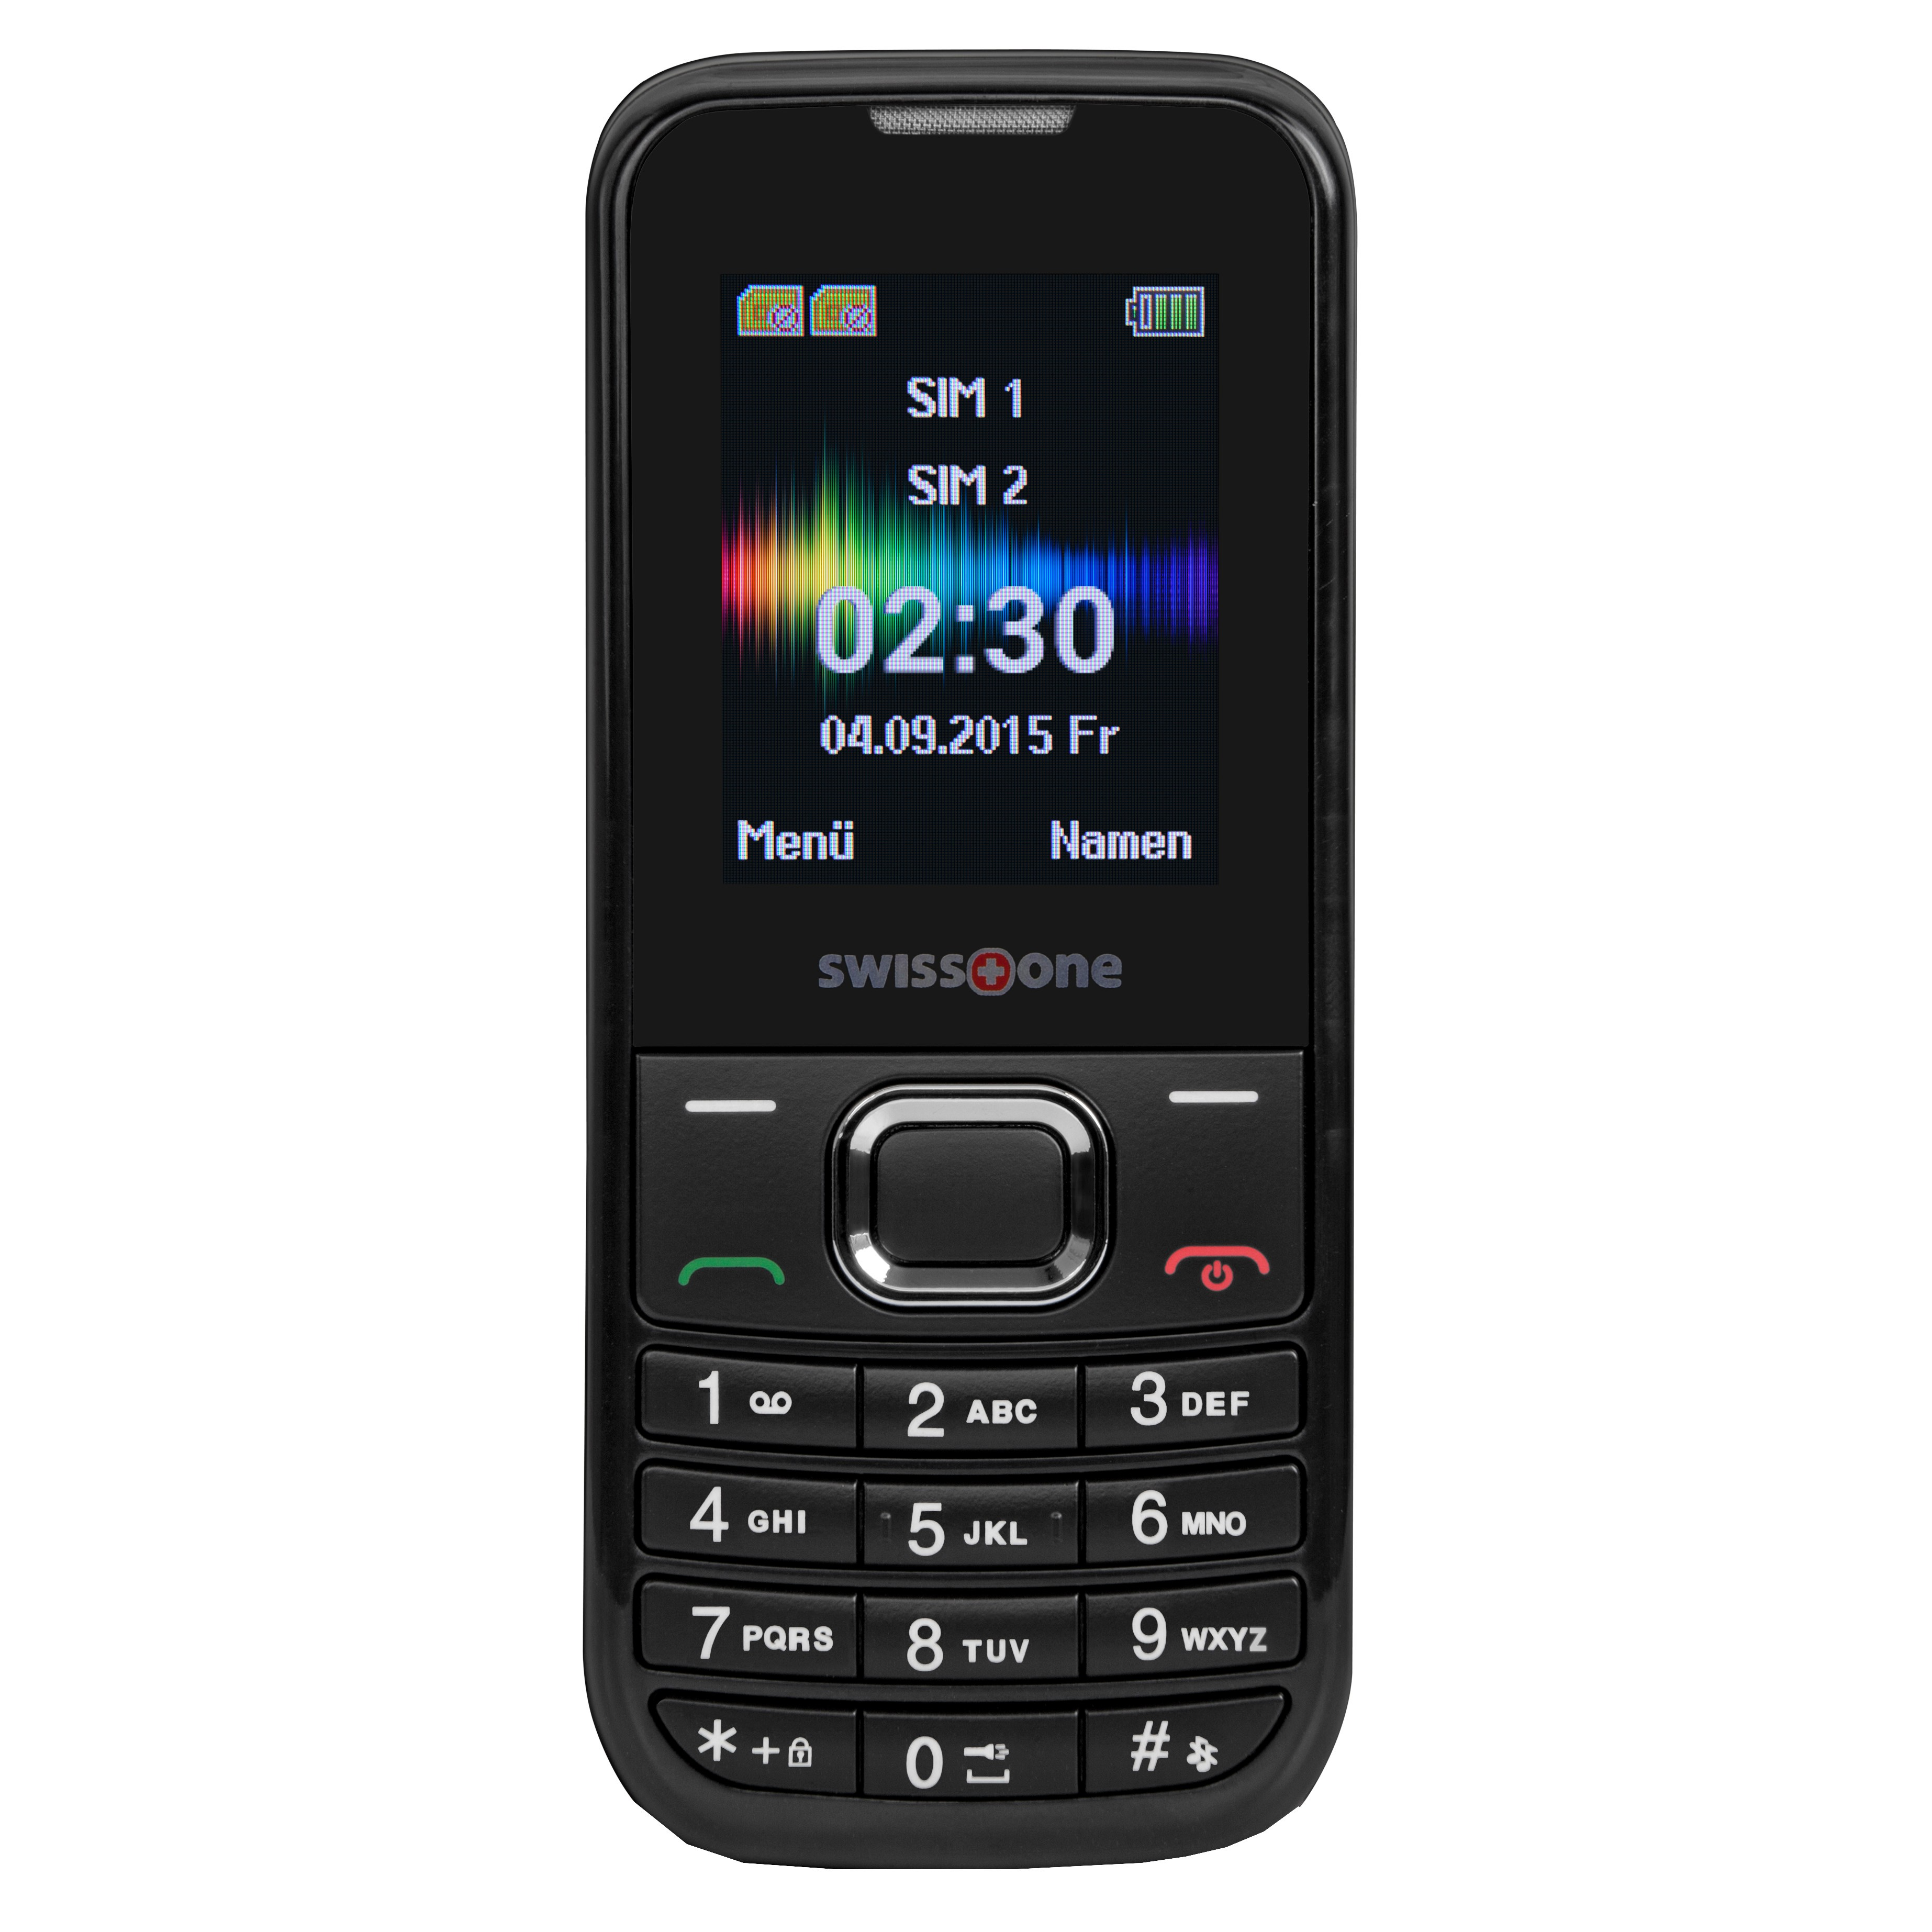 mobiltelefon dual sim - Prissøk - Gir deg laveste pris